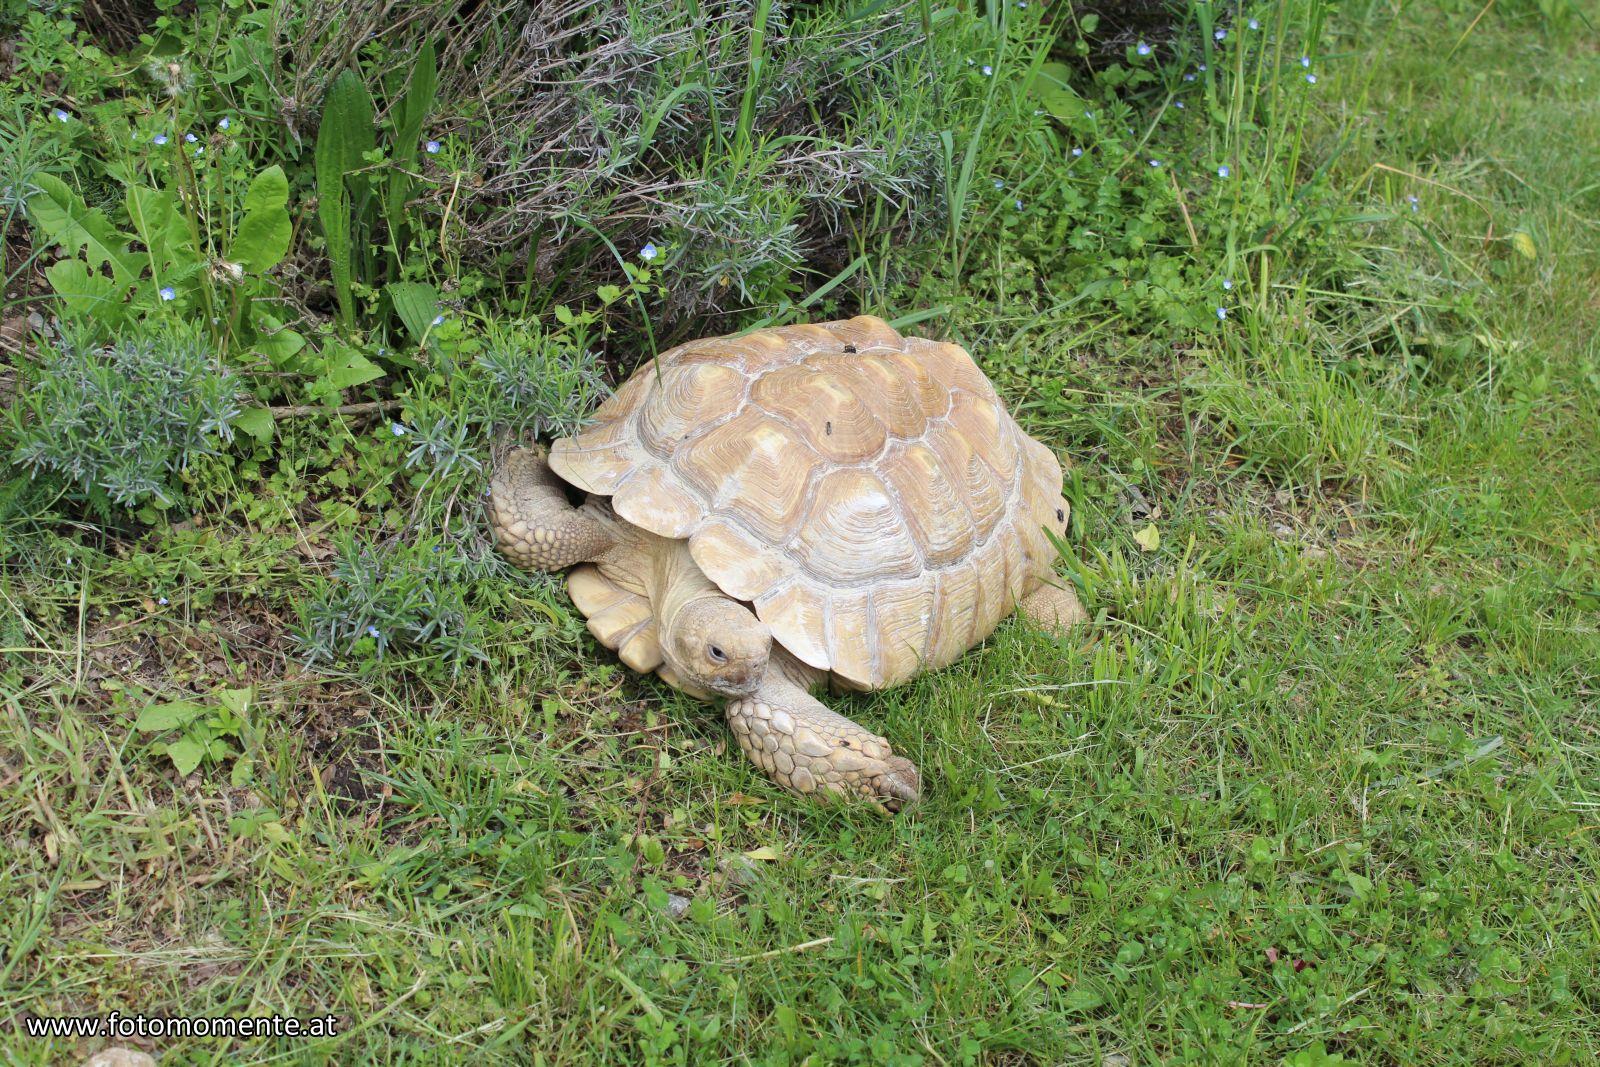 schildkroete - Schildkröte im Tierpark Herberstein